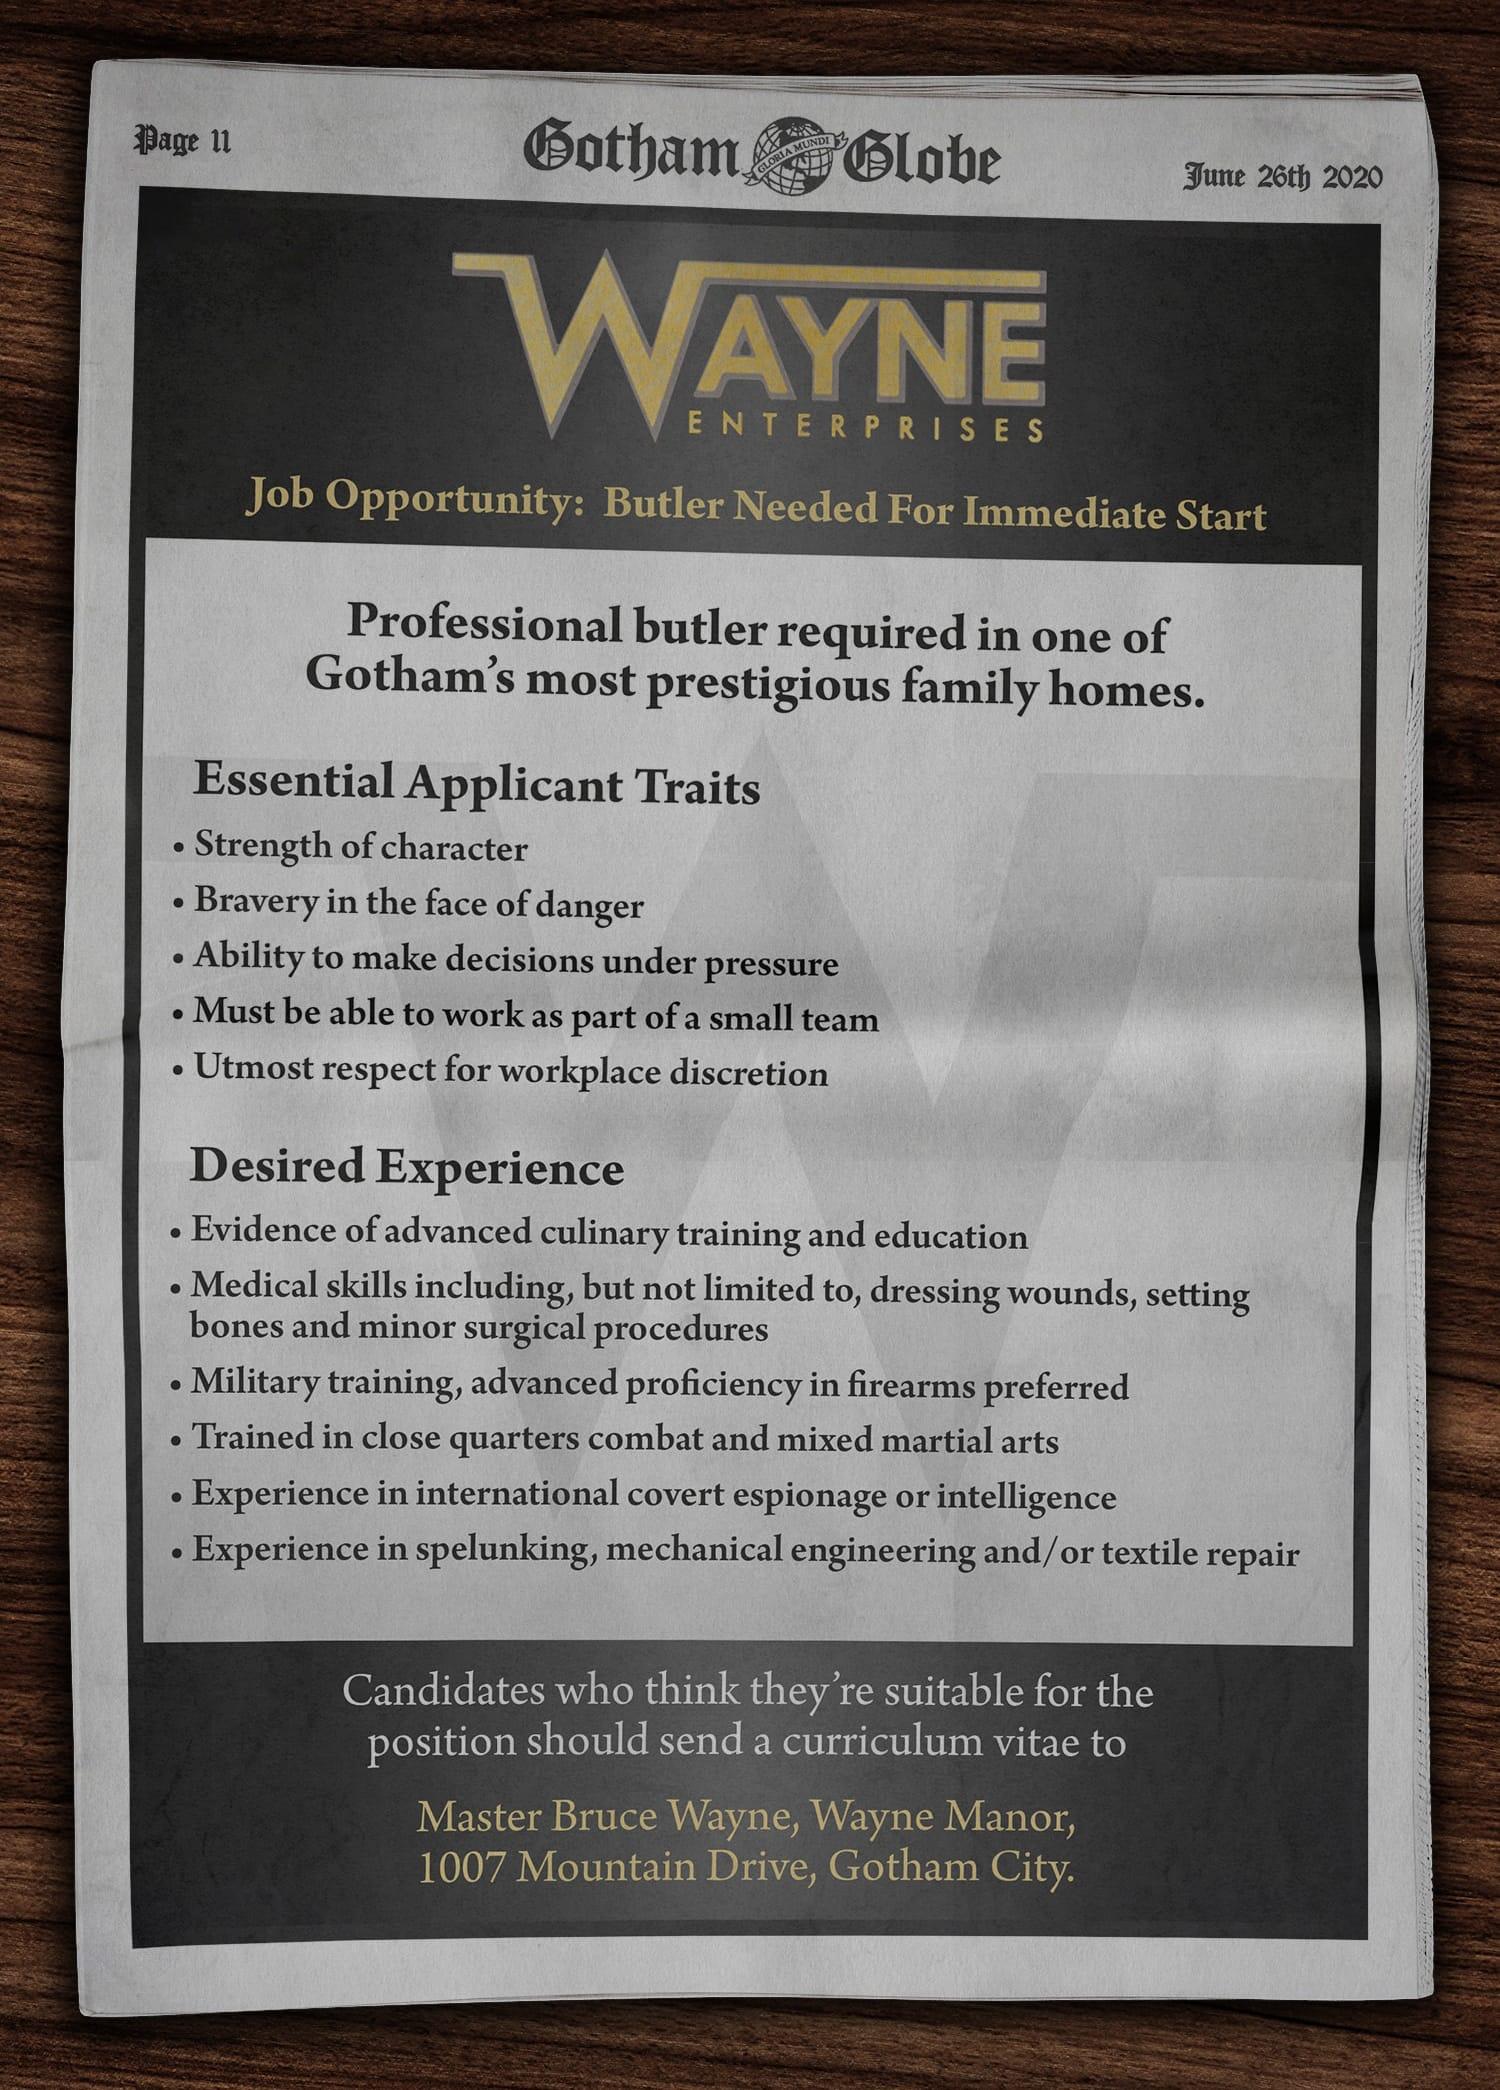 Fictional Batman recruitment poster - Wayne Enterprises advertisement for a professional butler in the Gotham Globe